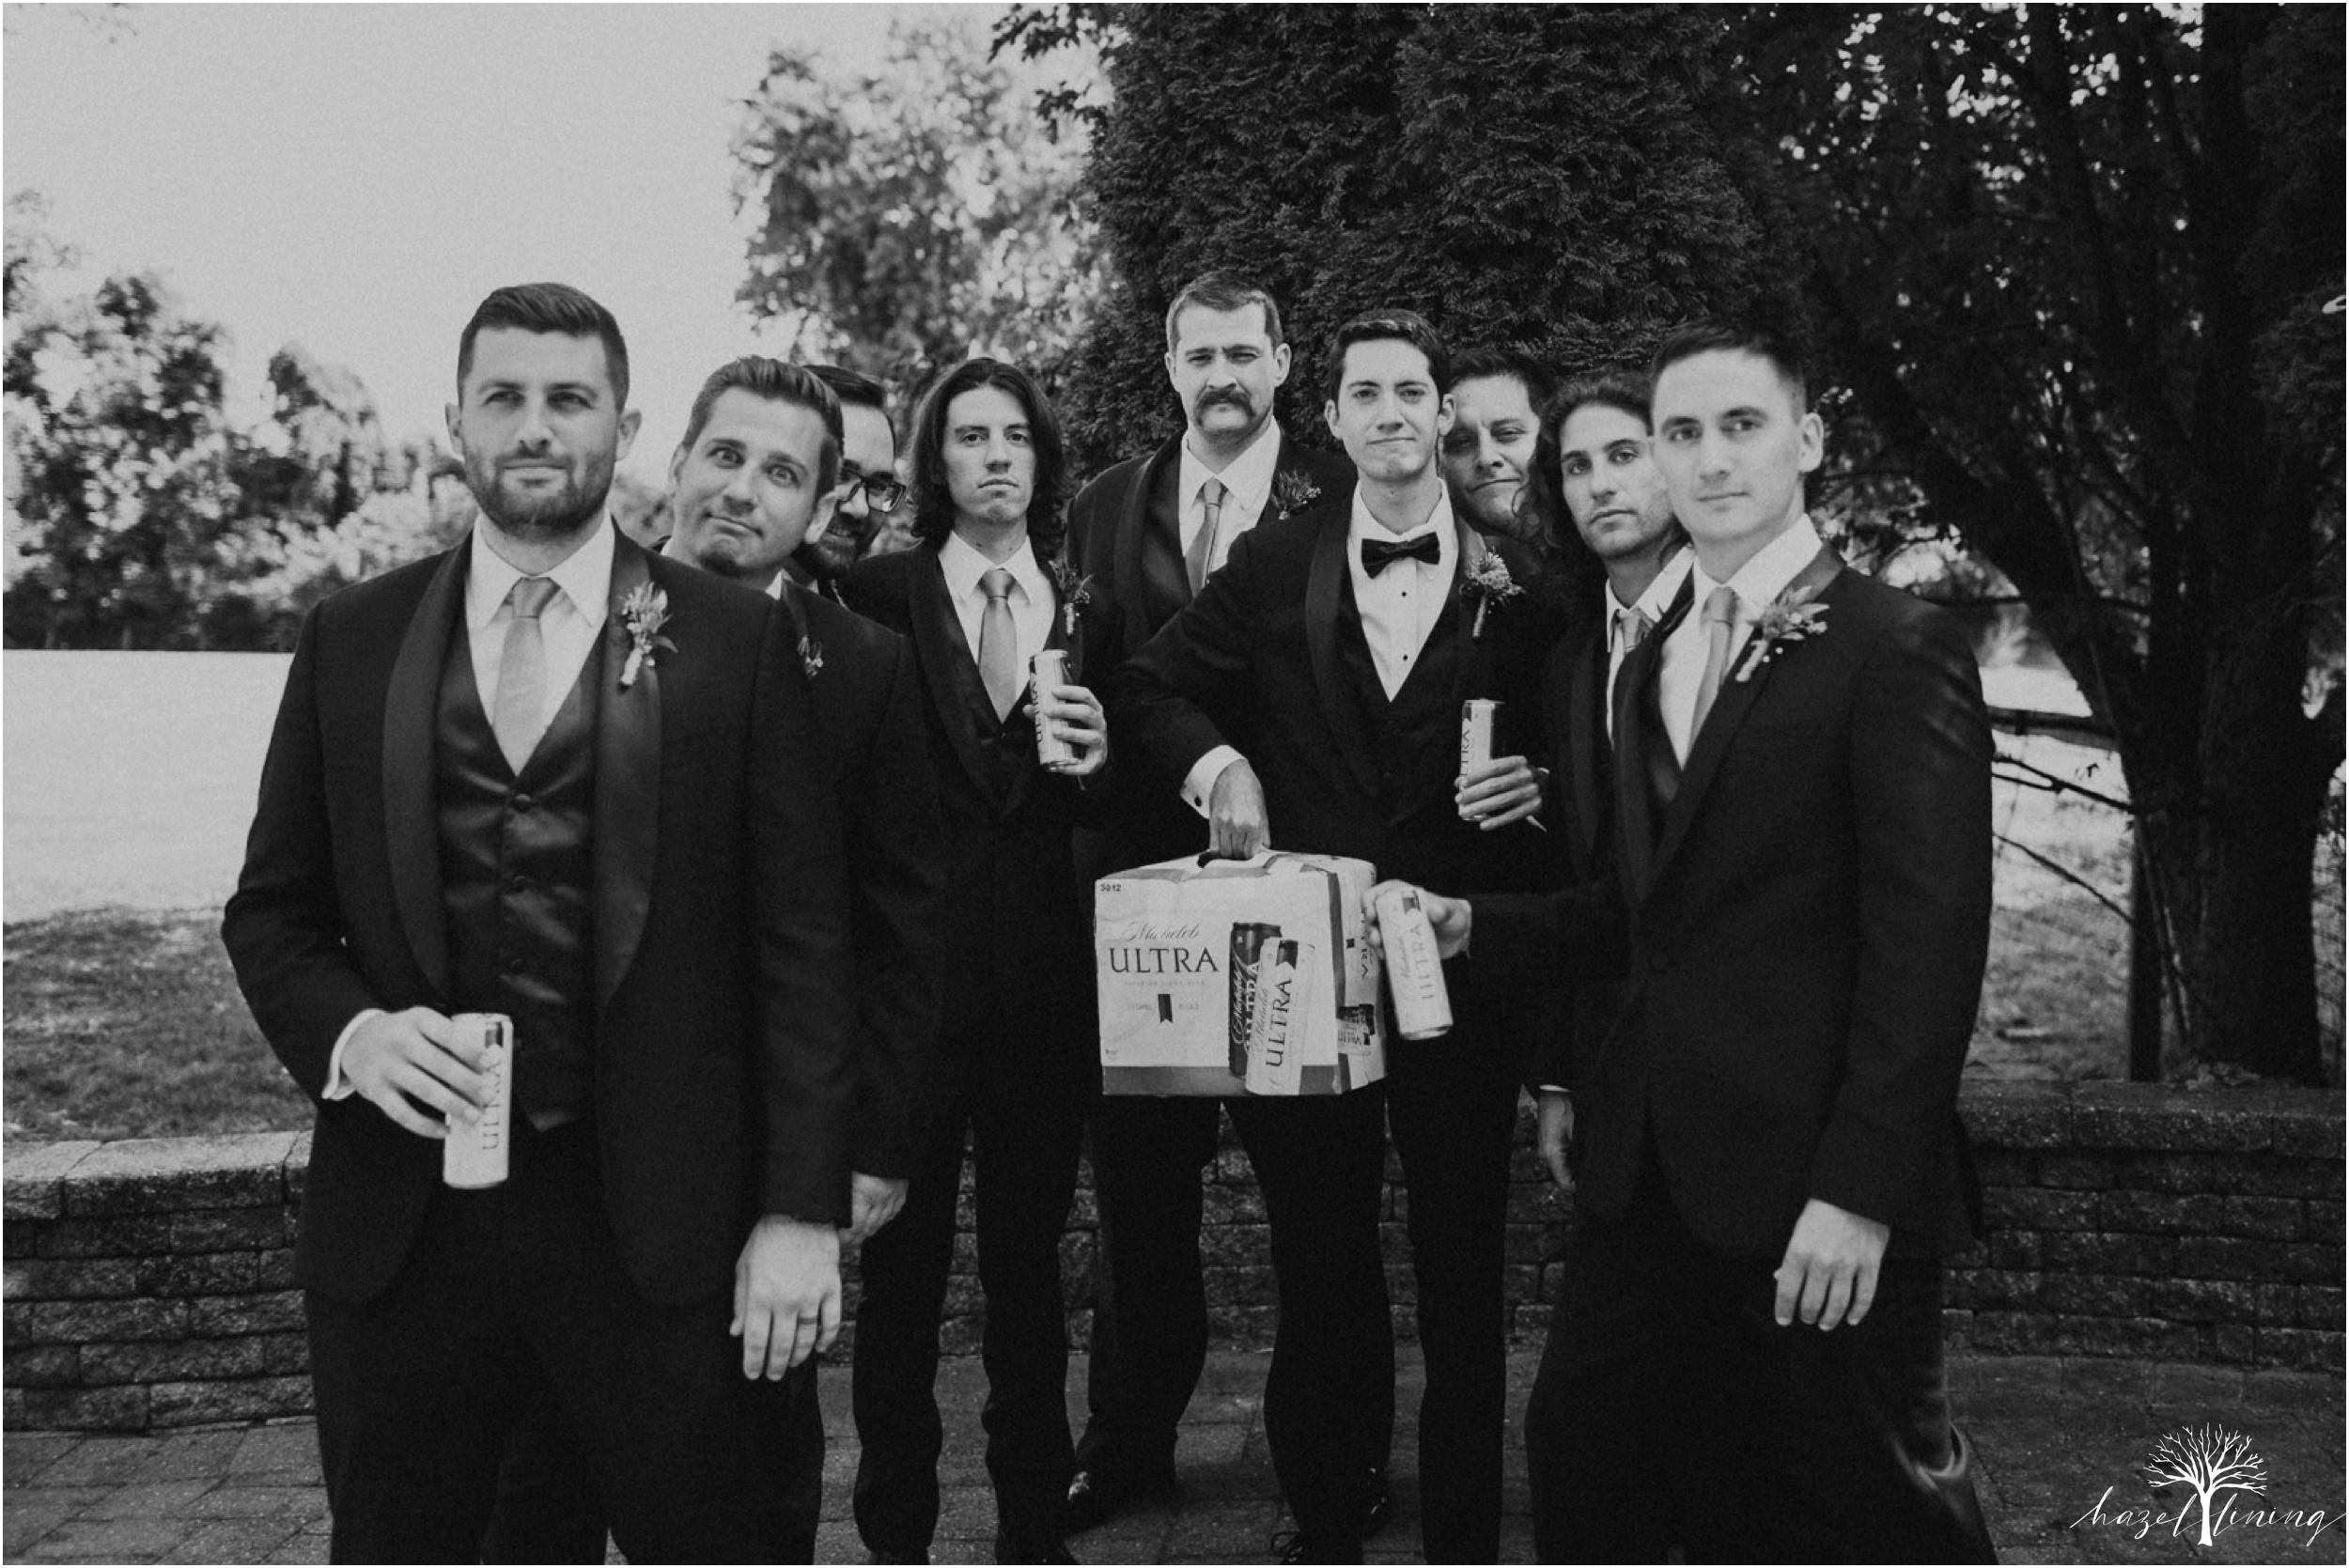 maureen-hepner-anthony-giordano-rose-bank-winery-newtow-pennsylvania-luxury-summer-wedding-hazel-lining-photography-destination-elopement-wedding-engagement-photography_0054.jpg